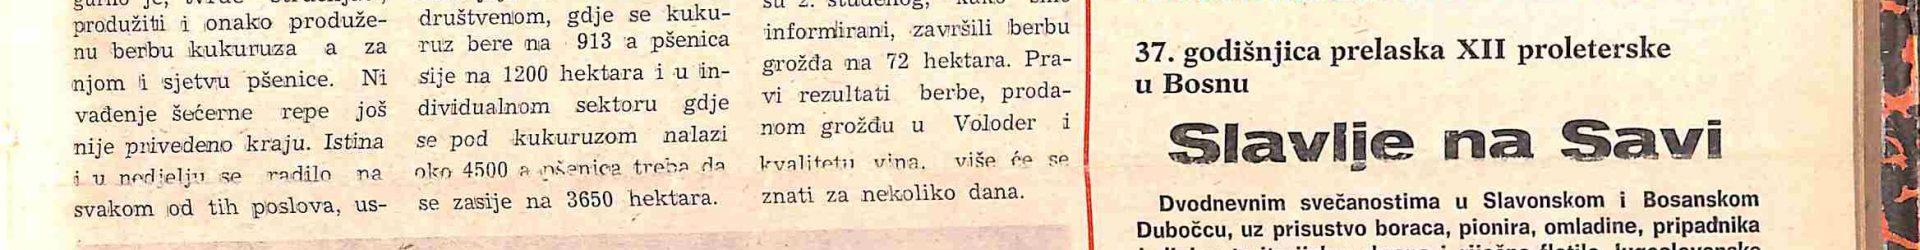 6. studeni 1980.